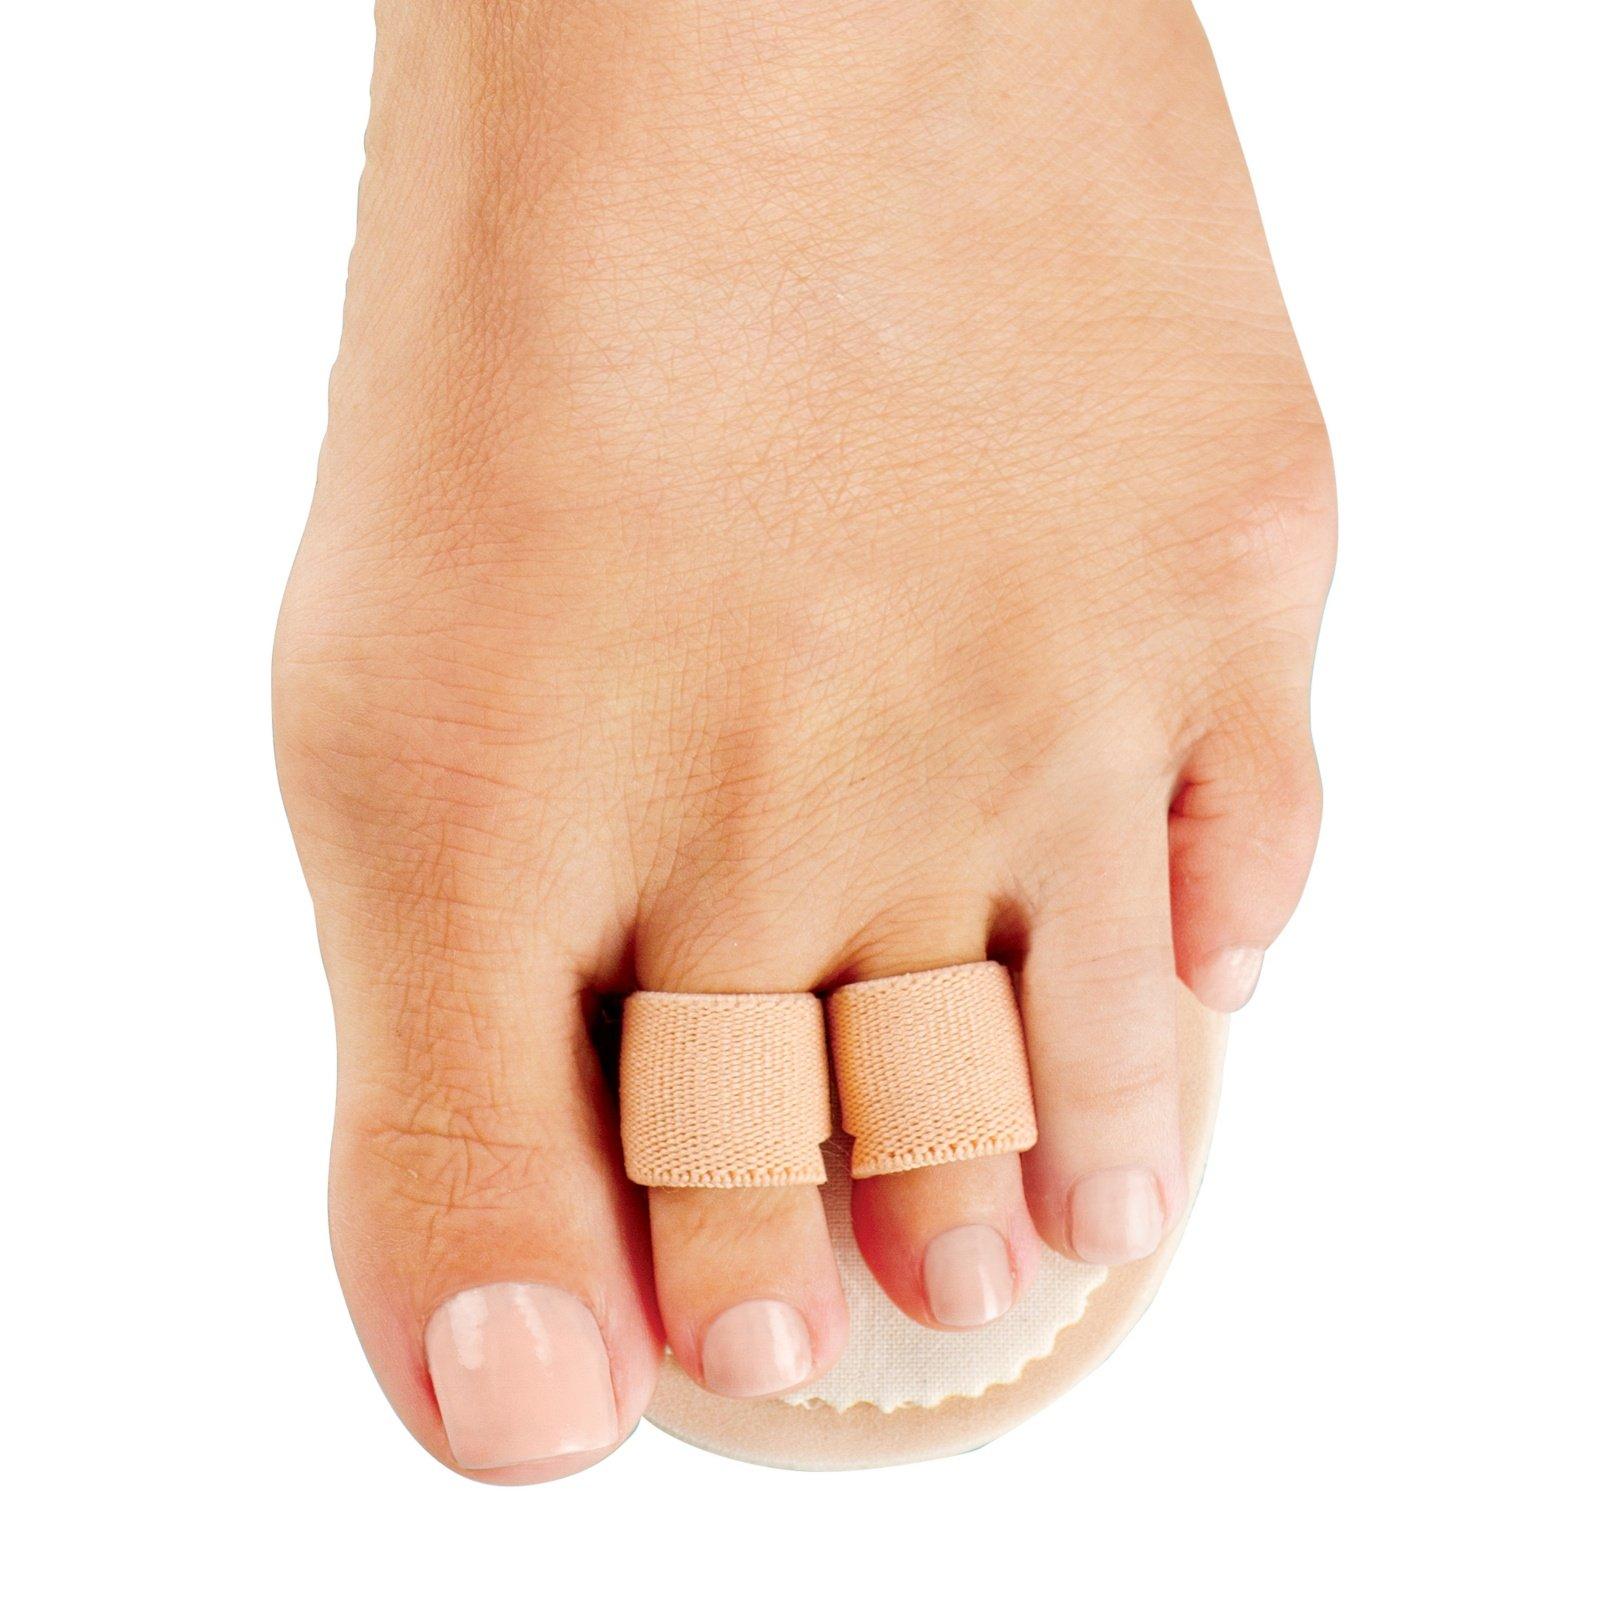 FootSmart Double Toe Straightener